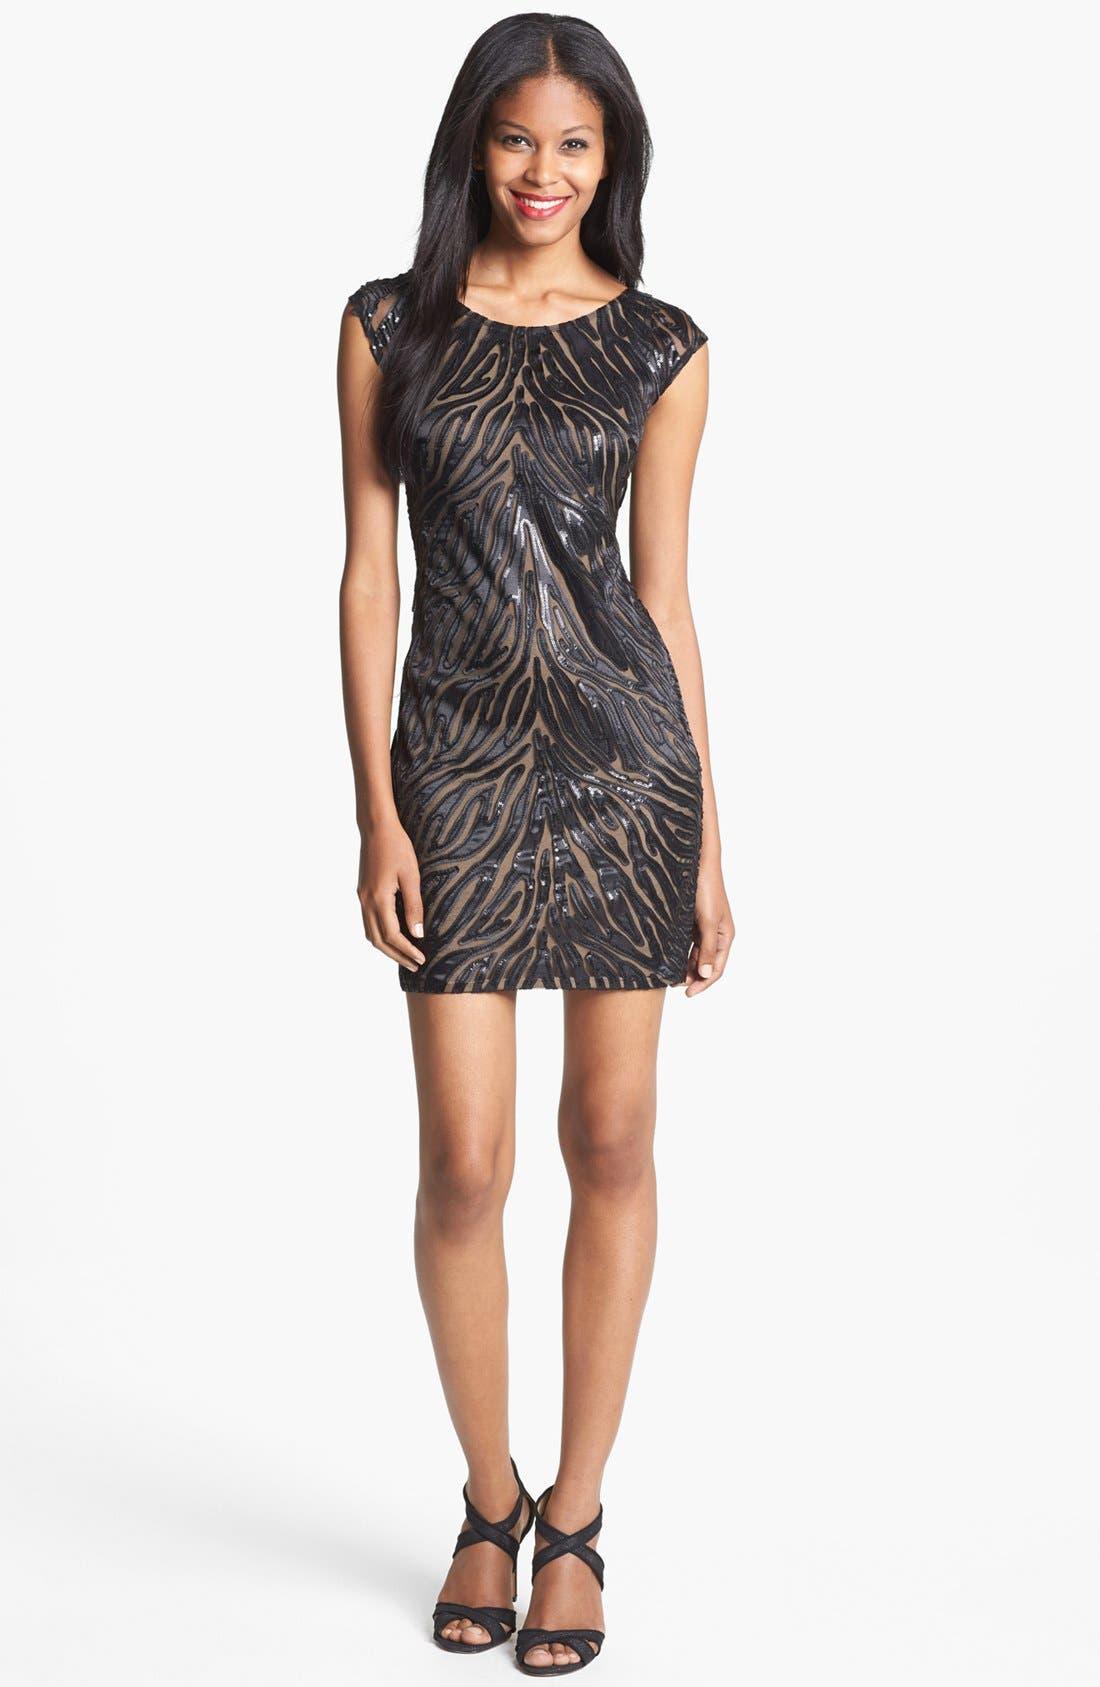 Main Image - B44 Dressed by Bailey 44 'Stranger of Desire' Embellished Sheath Dress